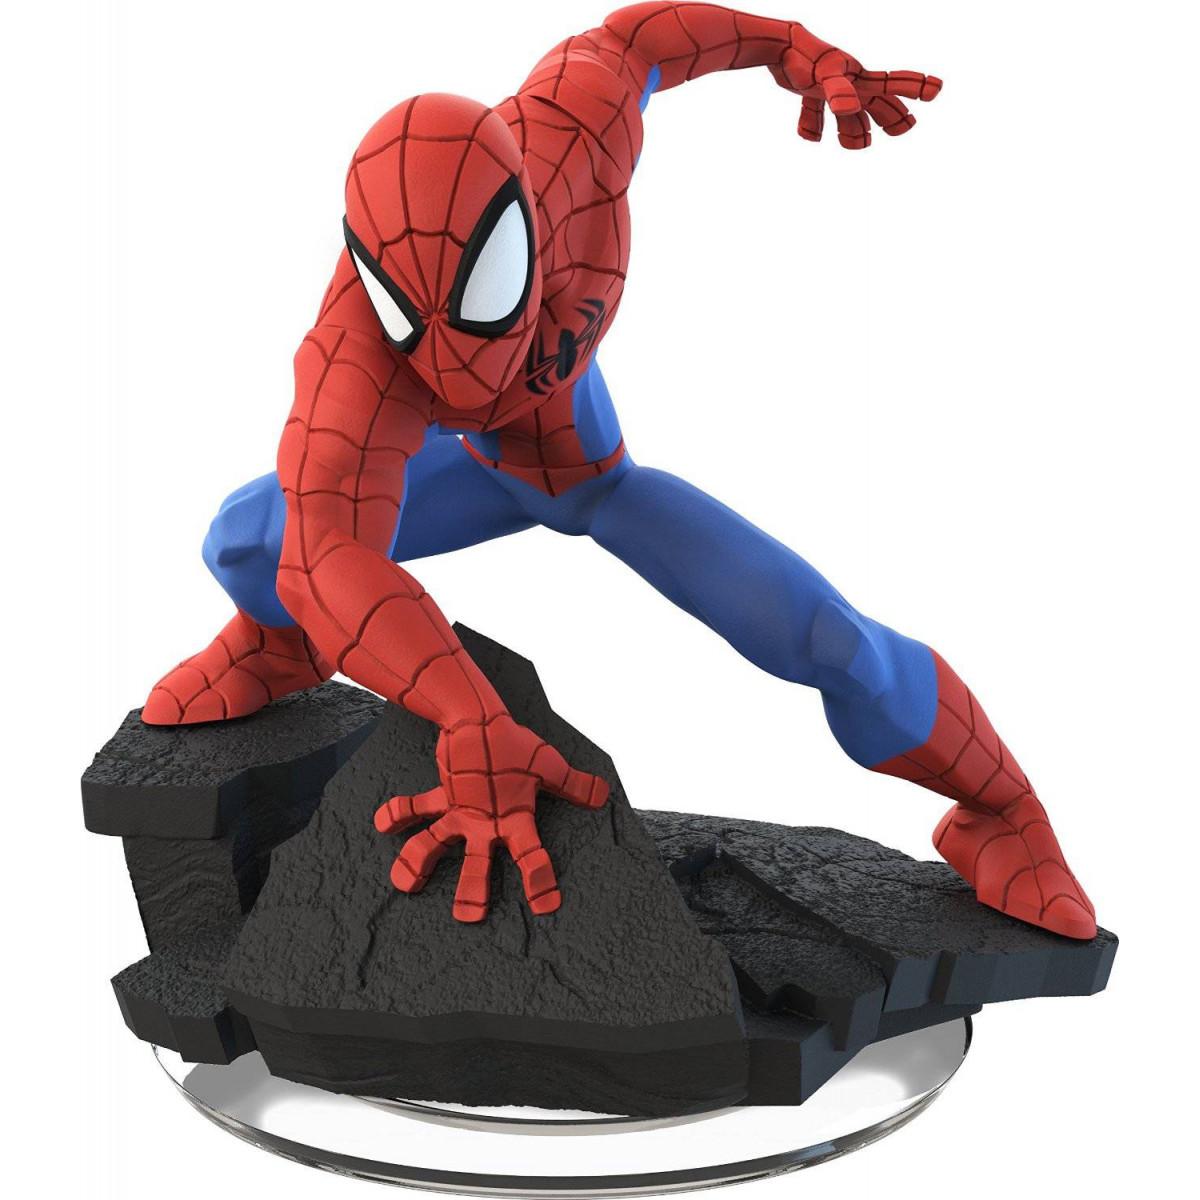 Disney Infinity 2.0 - Spider-Man játékfigura